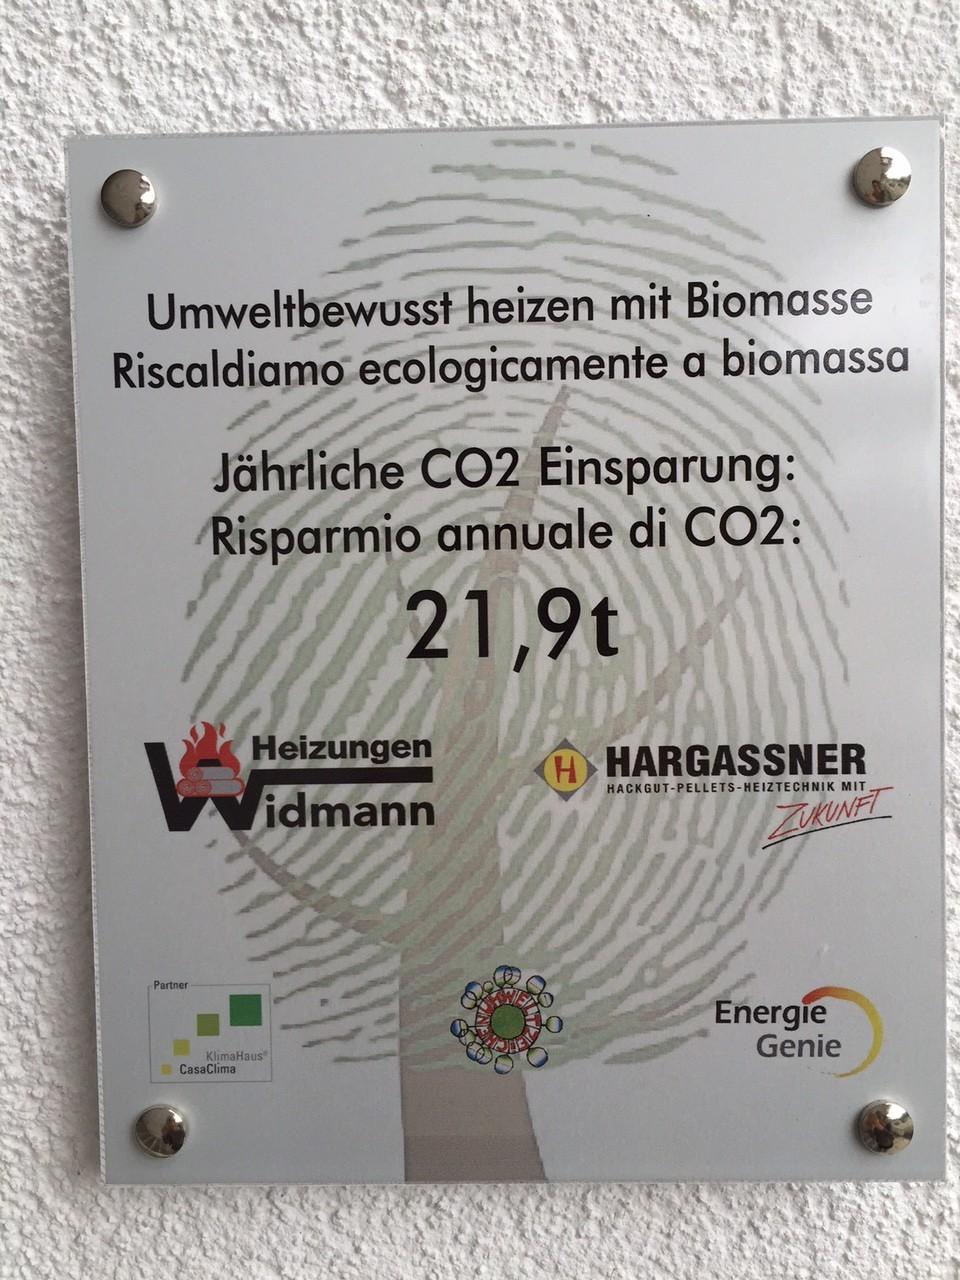 Minus 21,9 t CO2!